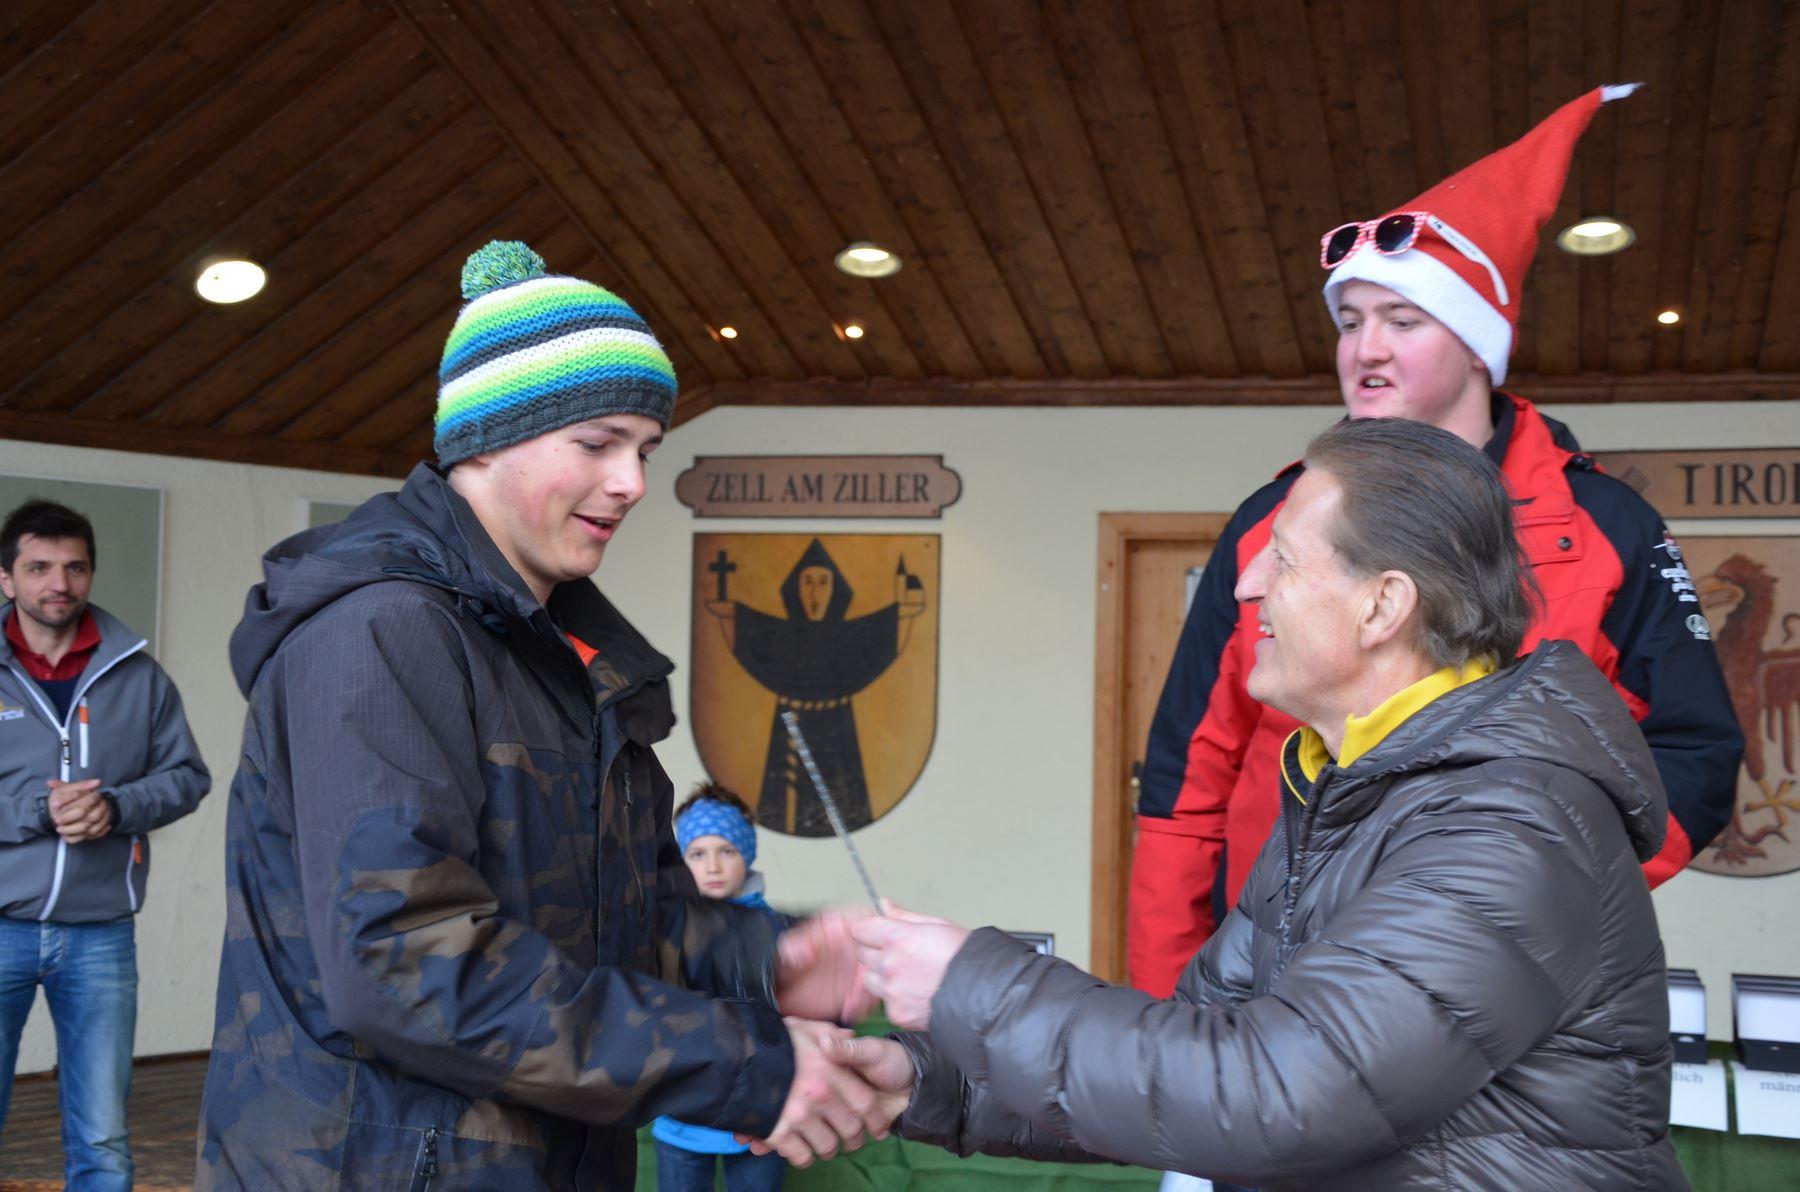 2015-03-22 BV Zillertal Skirennen 411.JPG